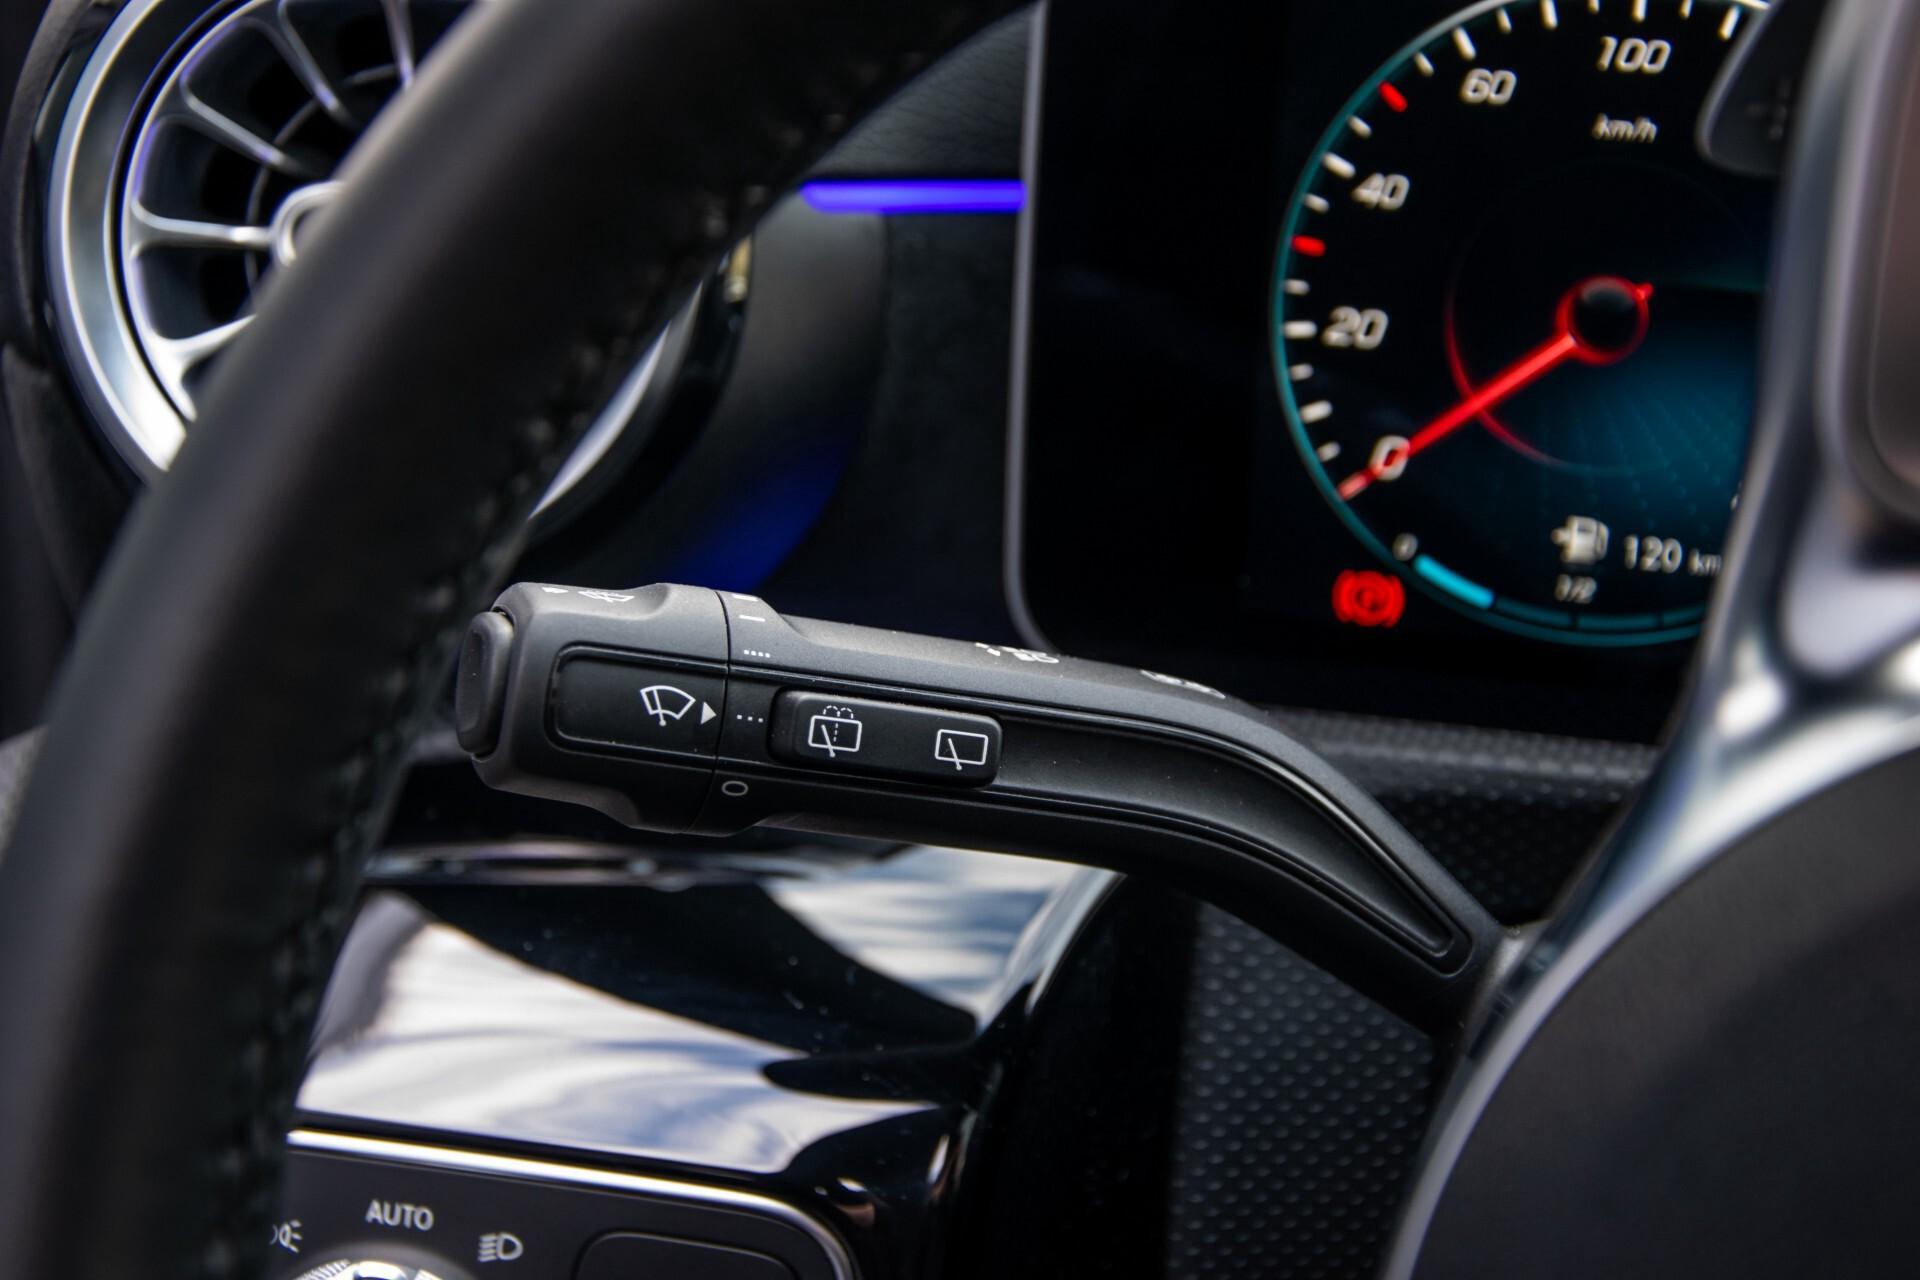 Mercedes-Benz A-Klasse 250 4-M AMG Panorama/Keyless-Entry/MBUX/HUD/Burmester/360/Multibeam LED Aut7 Foto 11